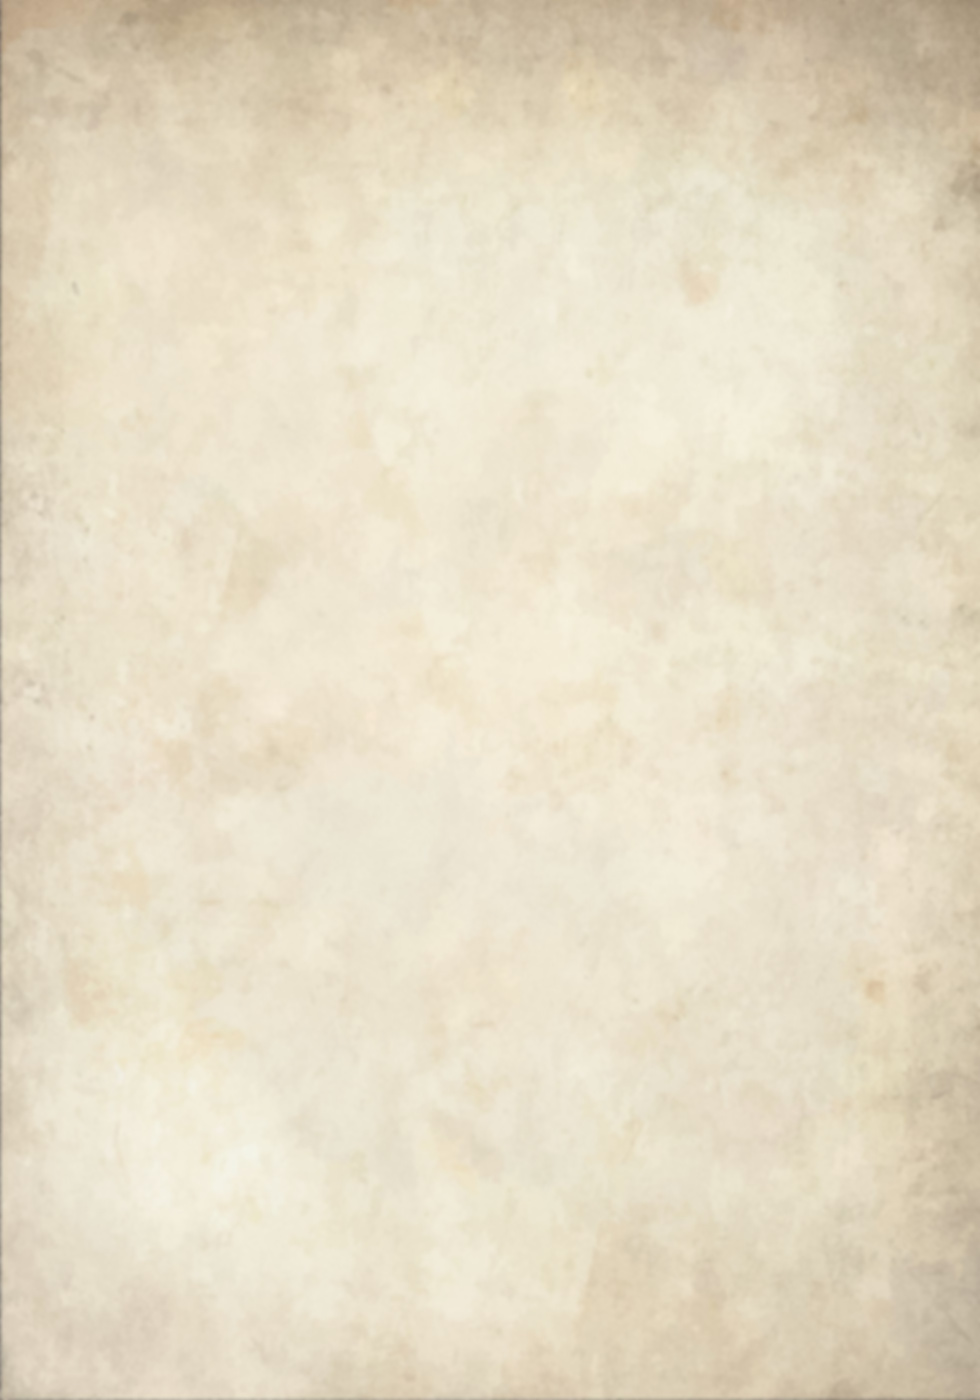 DD-Grunge-Paper-Texture-45342_upright.pn